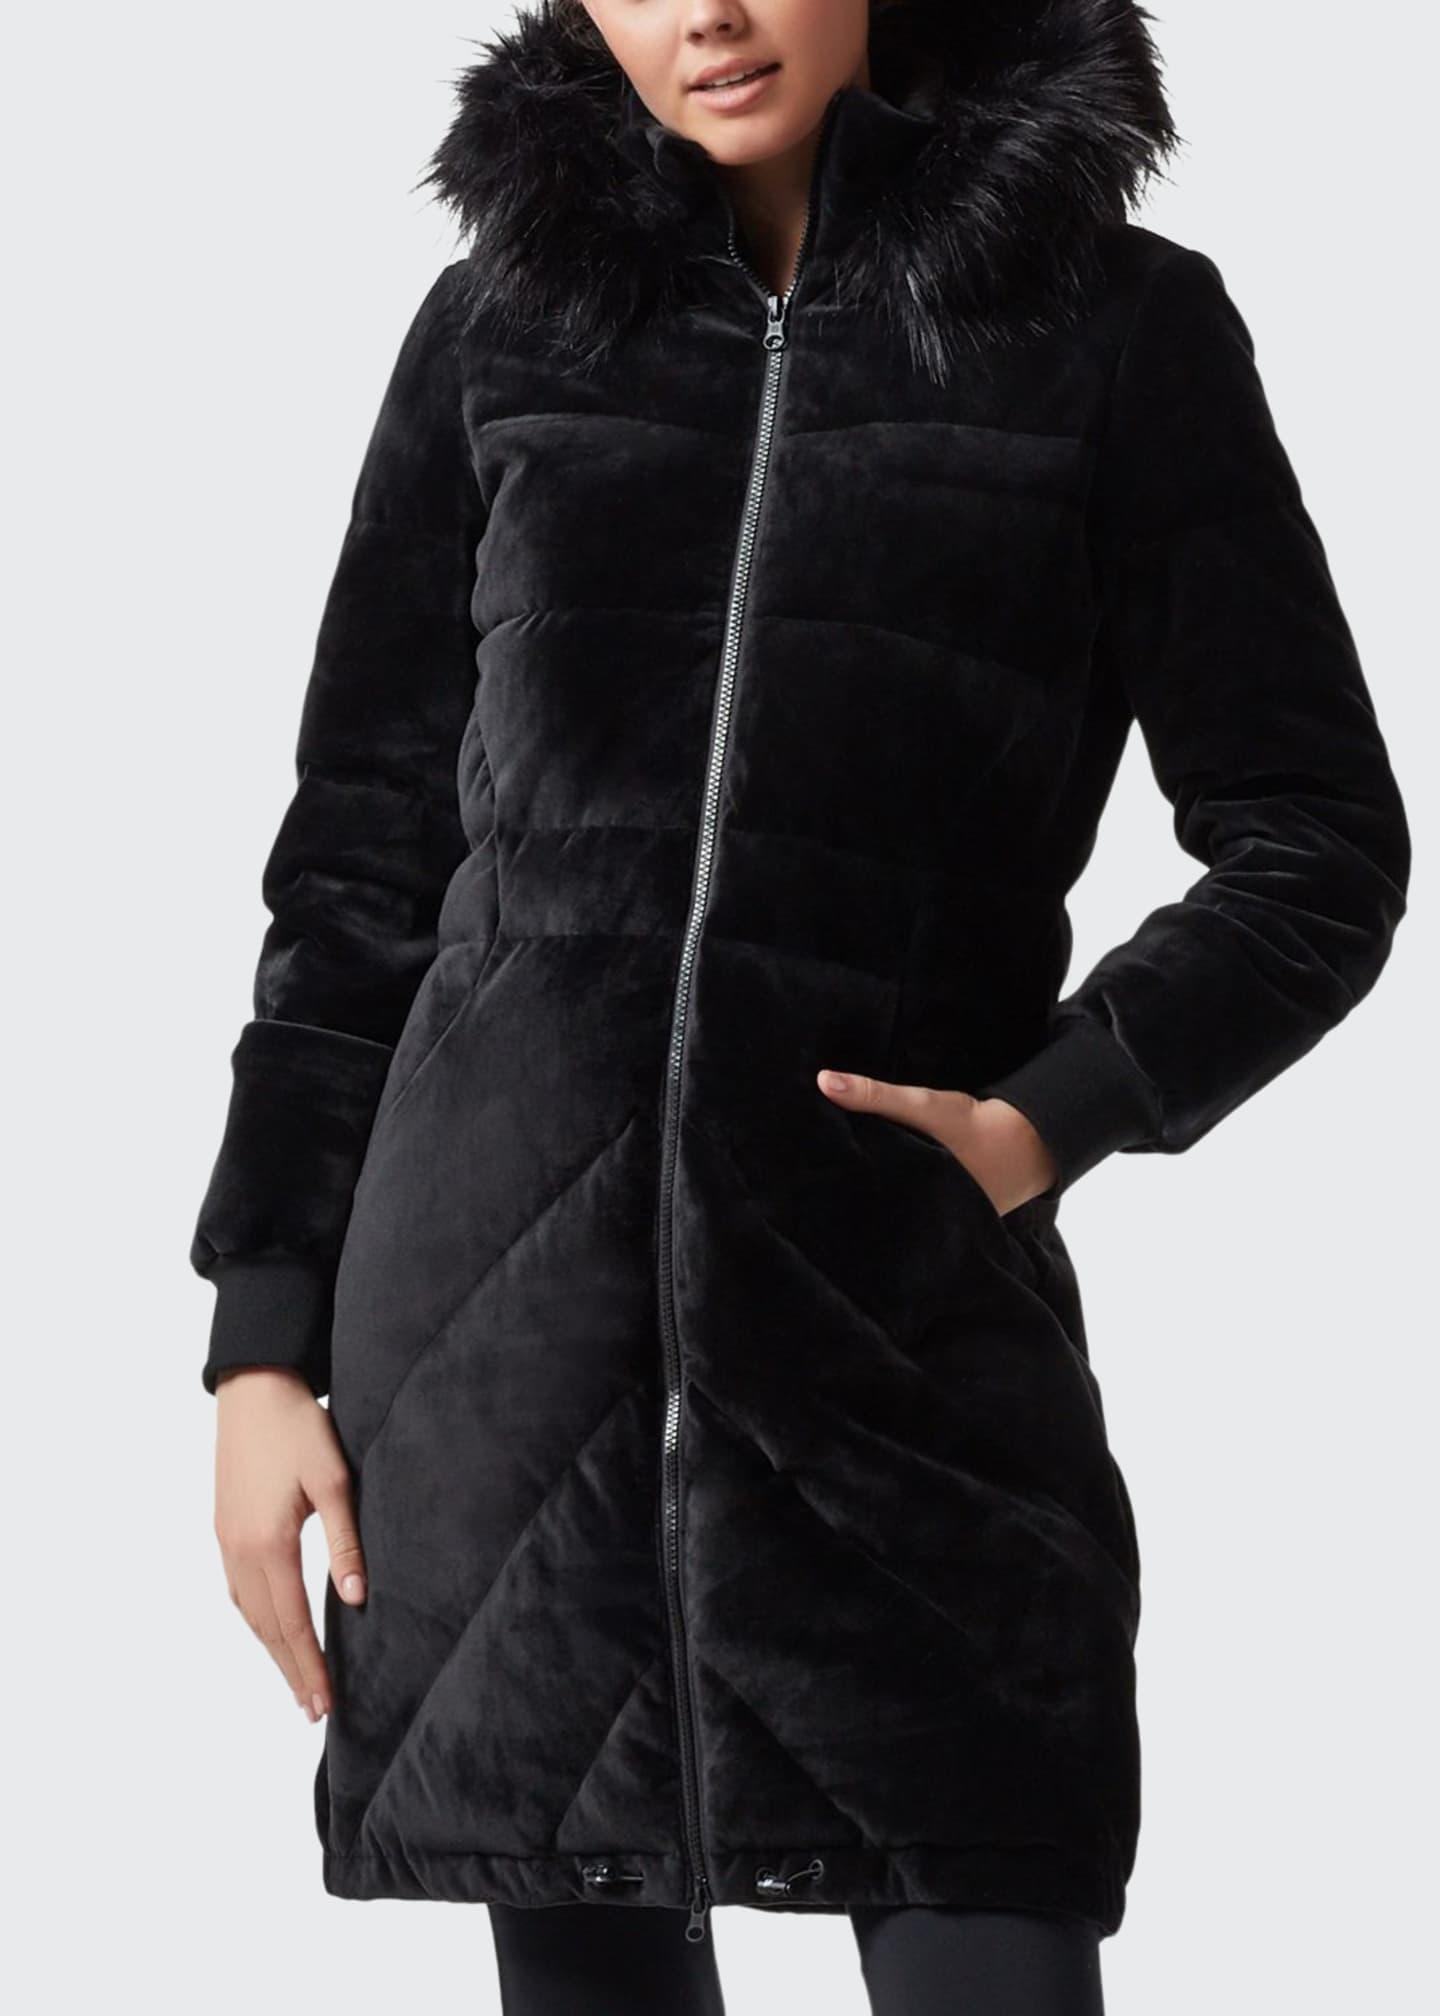 Blanc Noir Alexandra Velvet Puffer Jacket w/ Faux